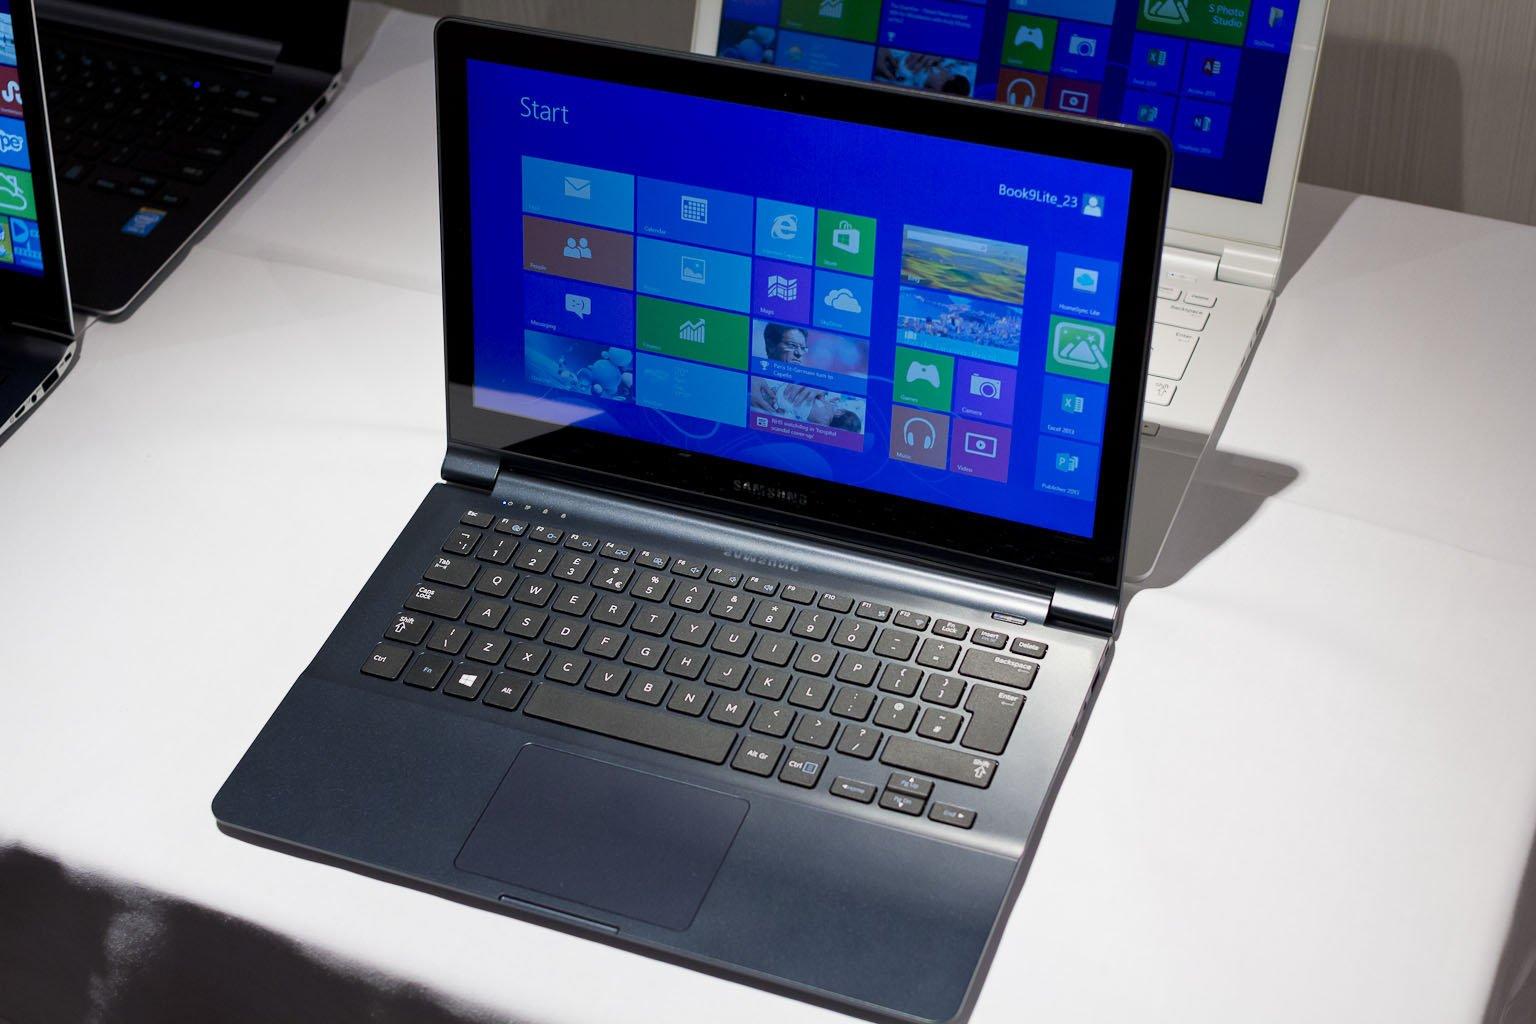 http://www.technopat.net/wp-content/uploads/2013/06/Samsung-ATIV-9-Plus.jpg